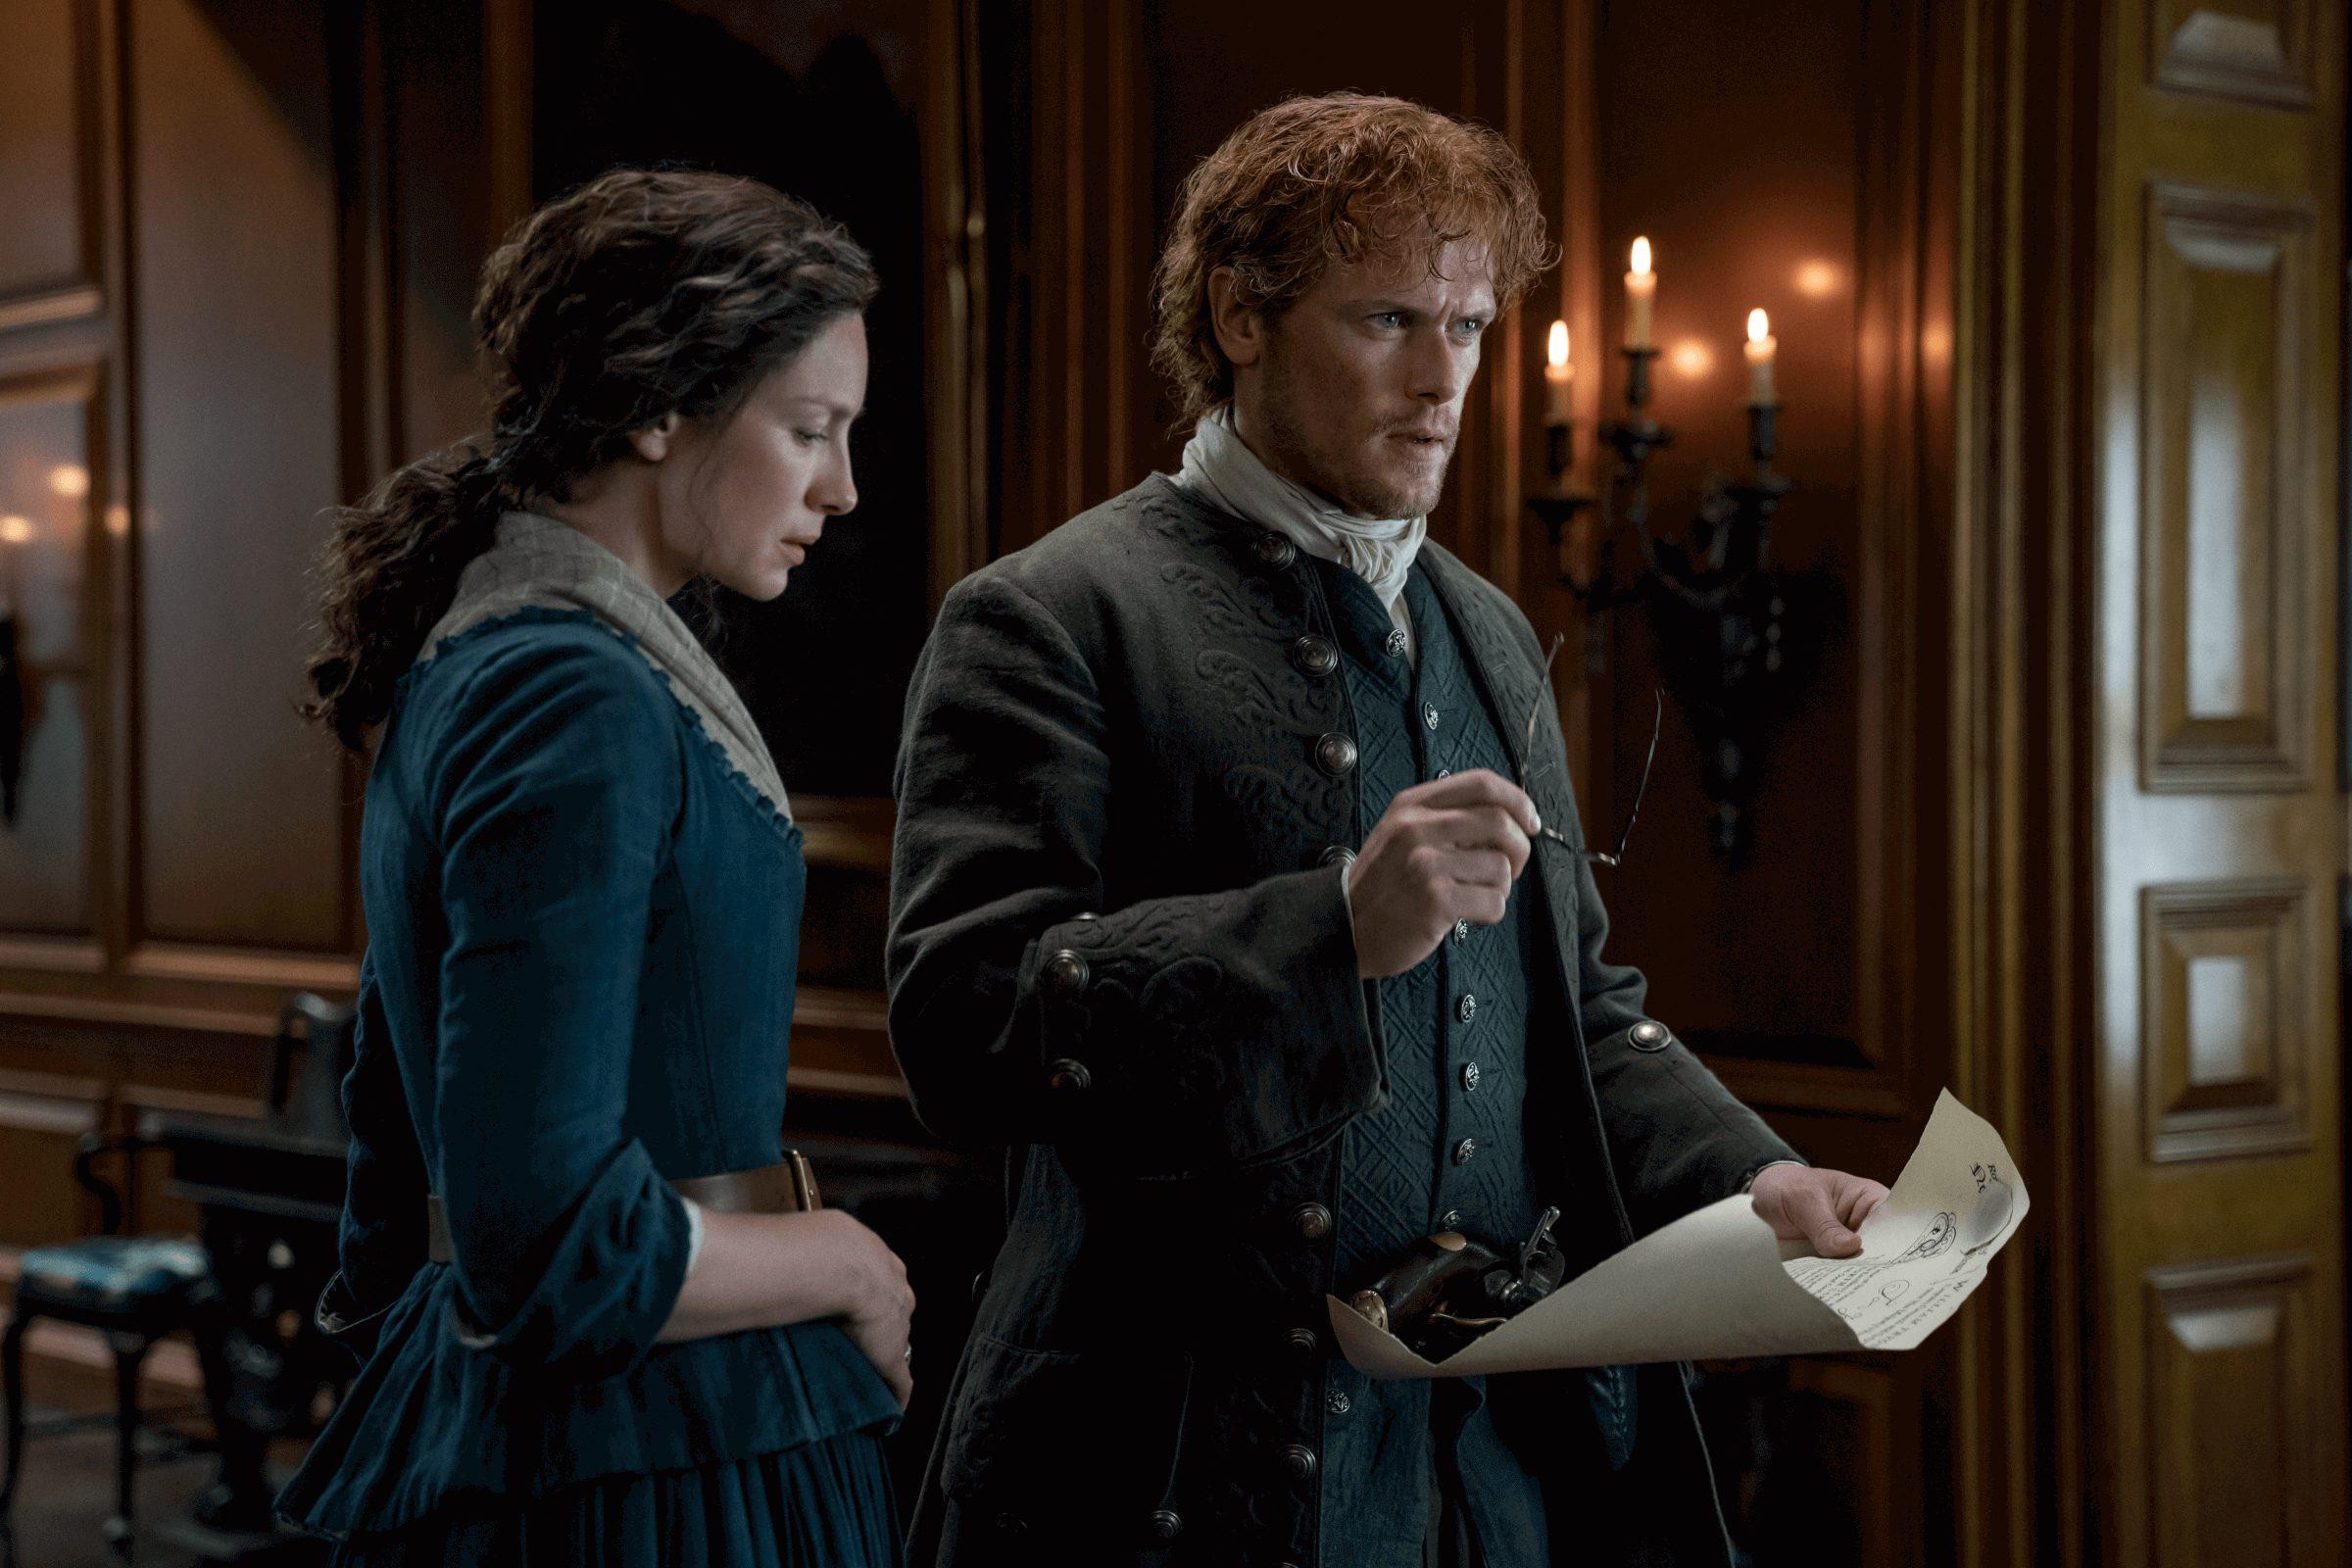 Outlander - Season 4 Finale - Man of Worth - FANdemonium Network